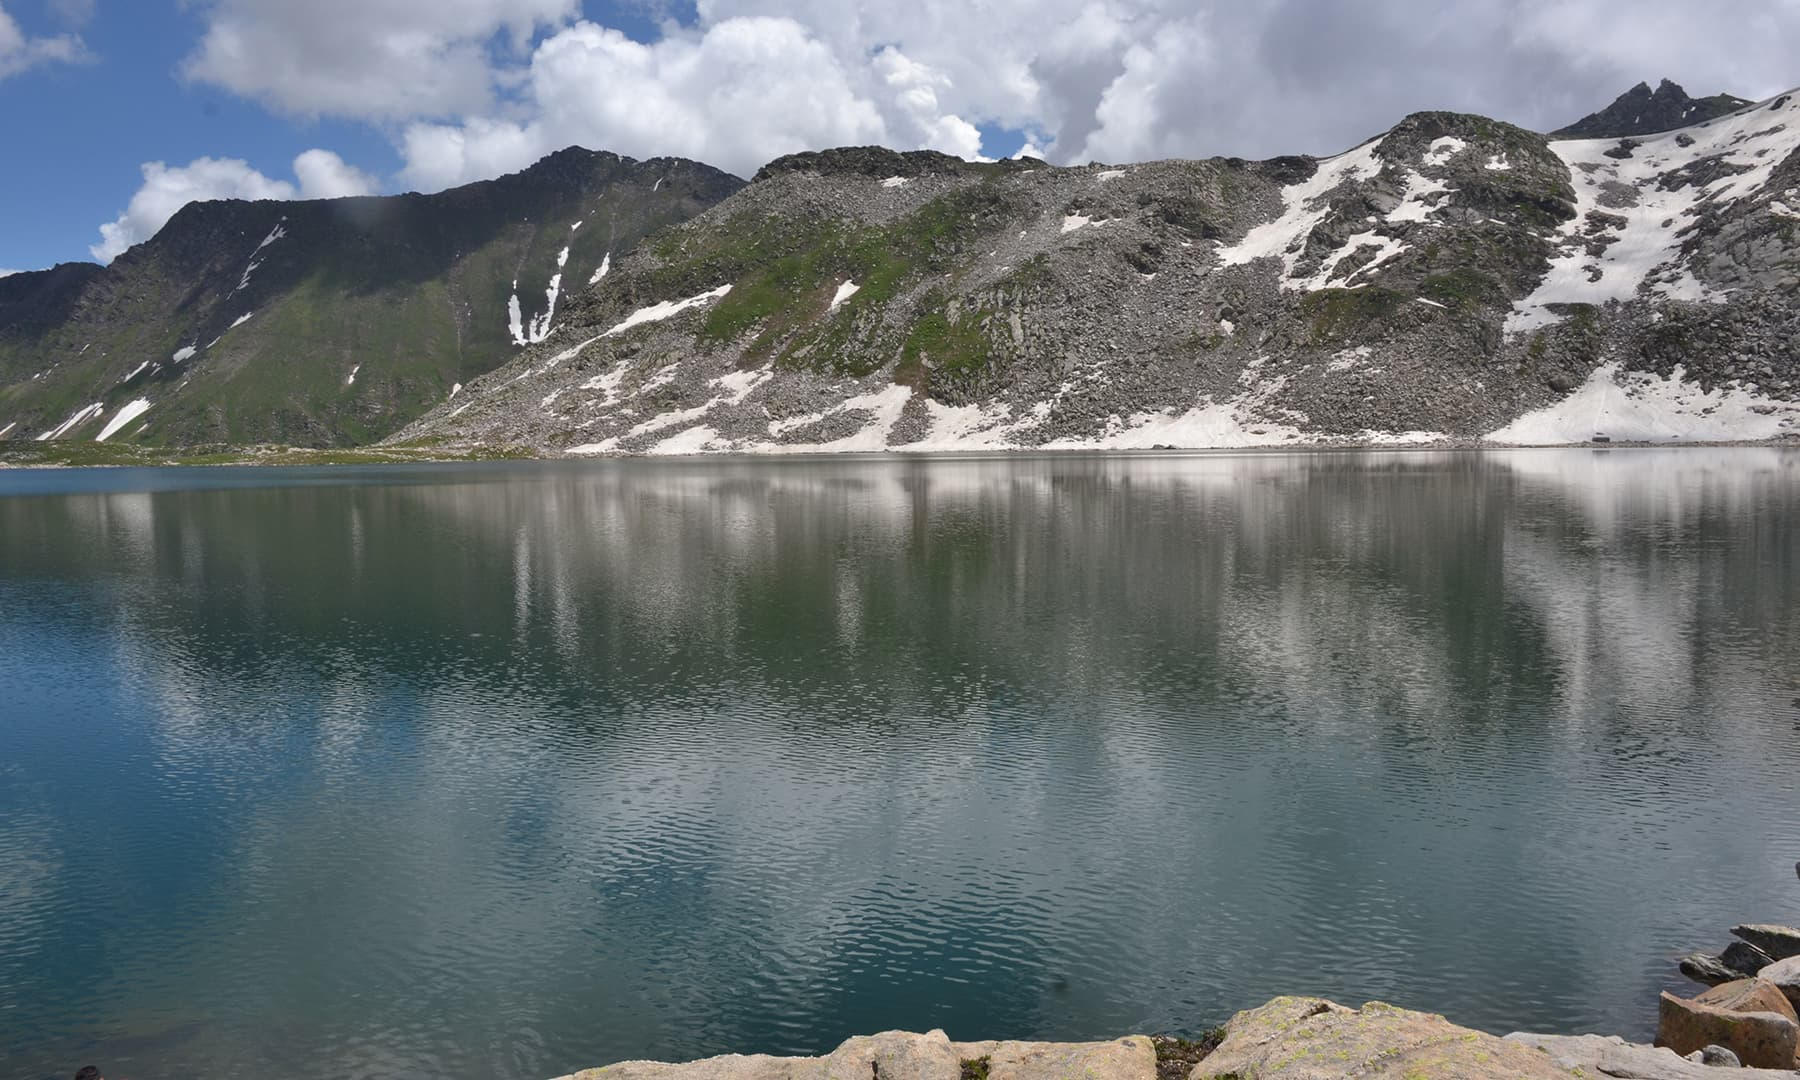 جھیل کا ایک دلفریب منظر—واصل محمود